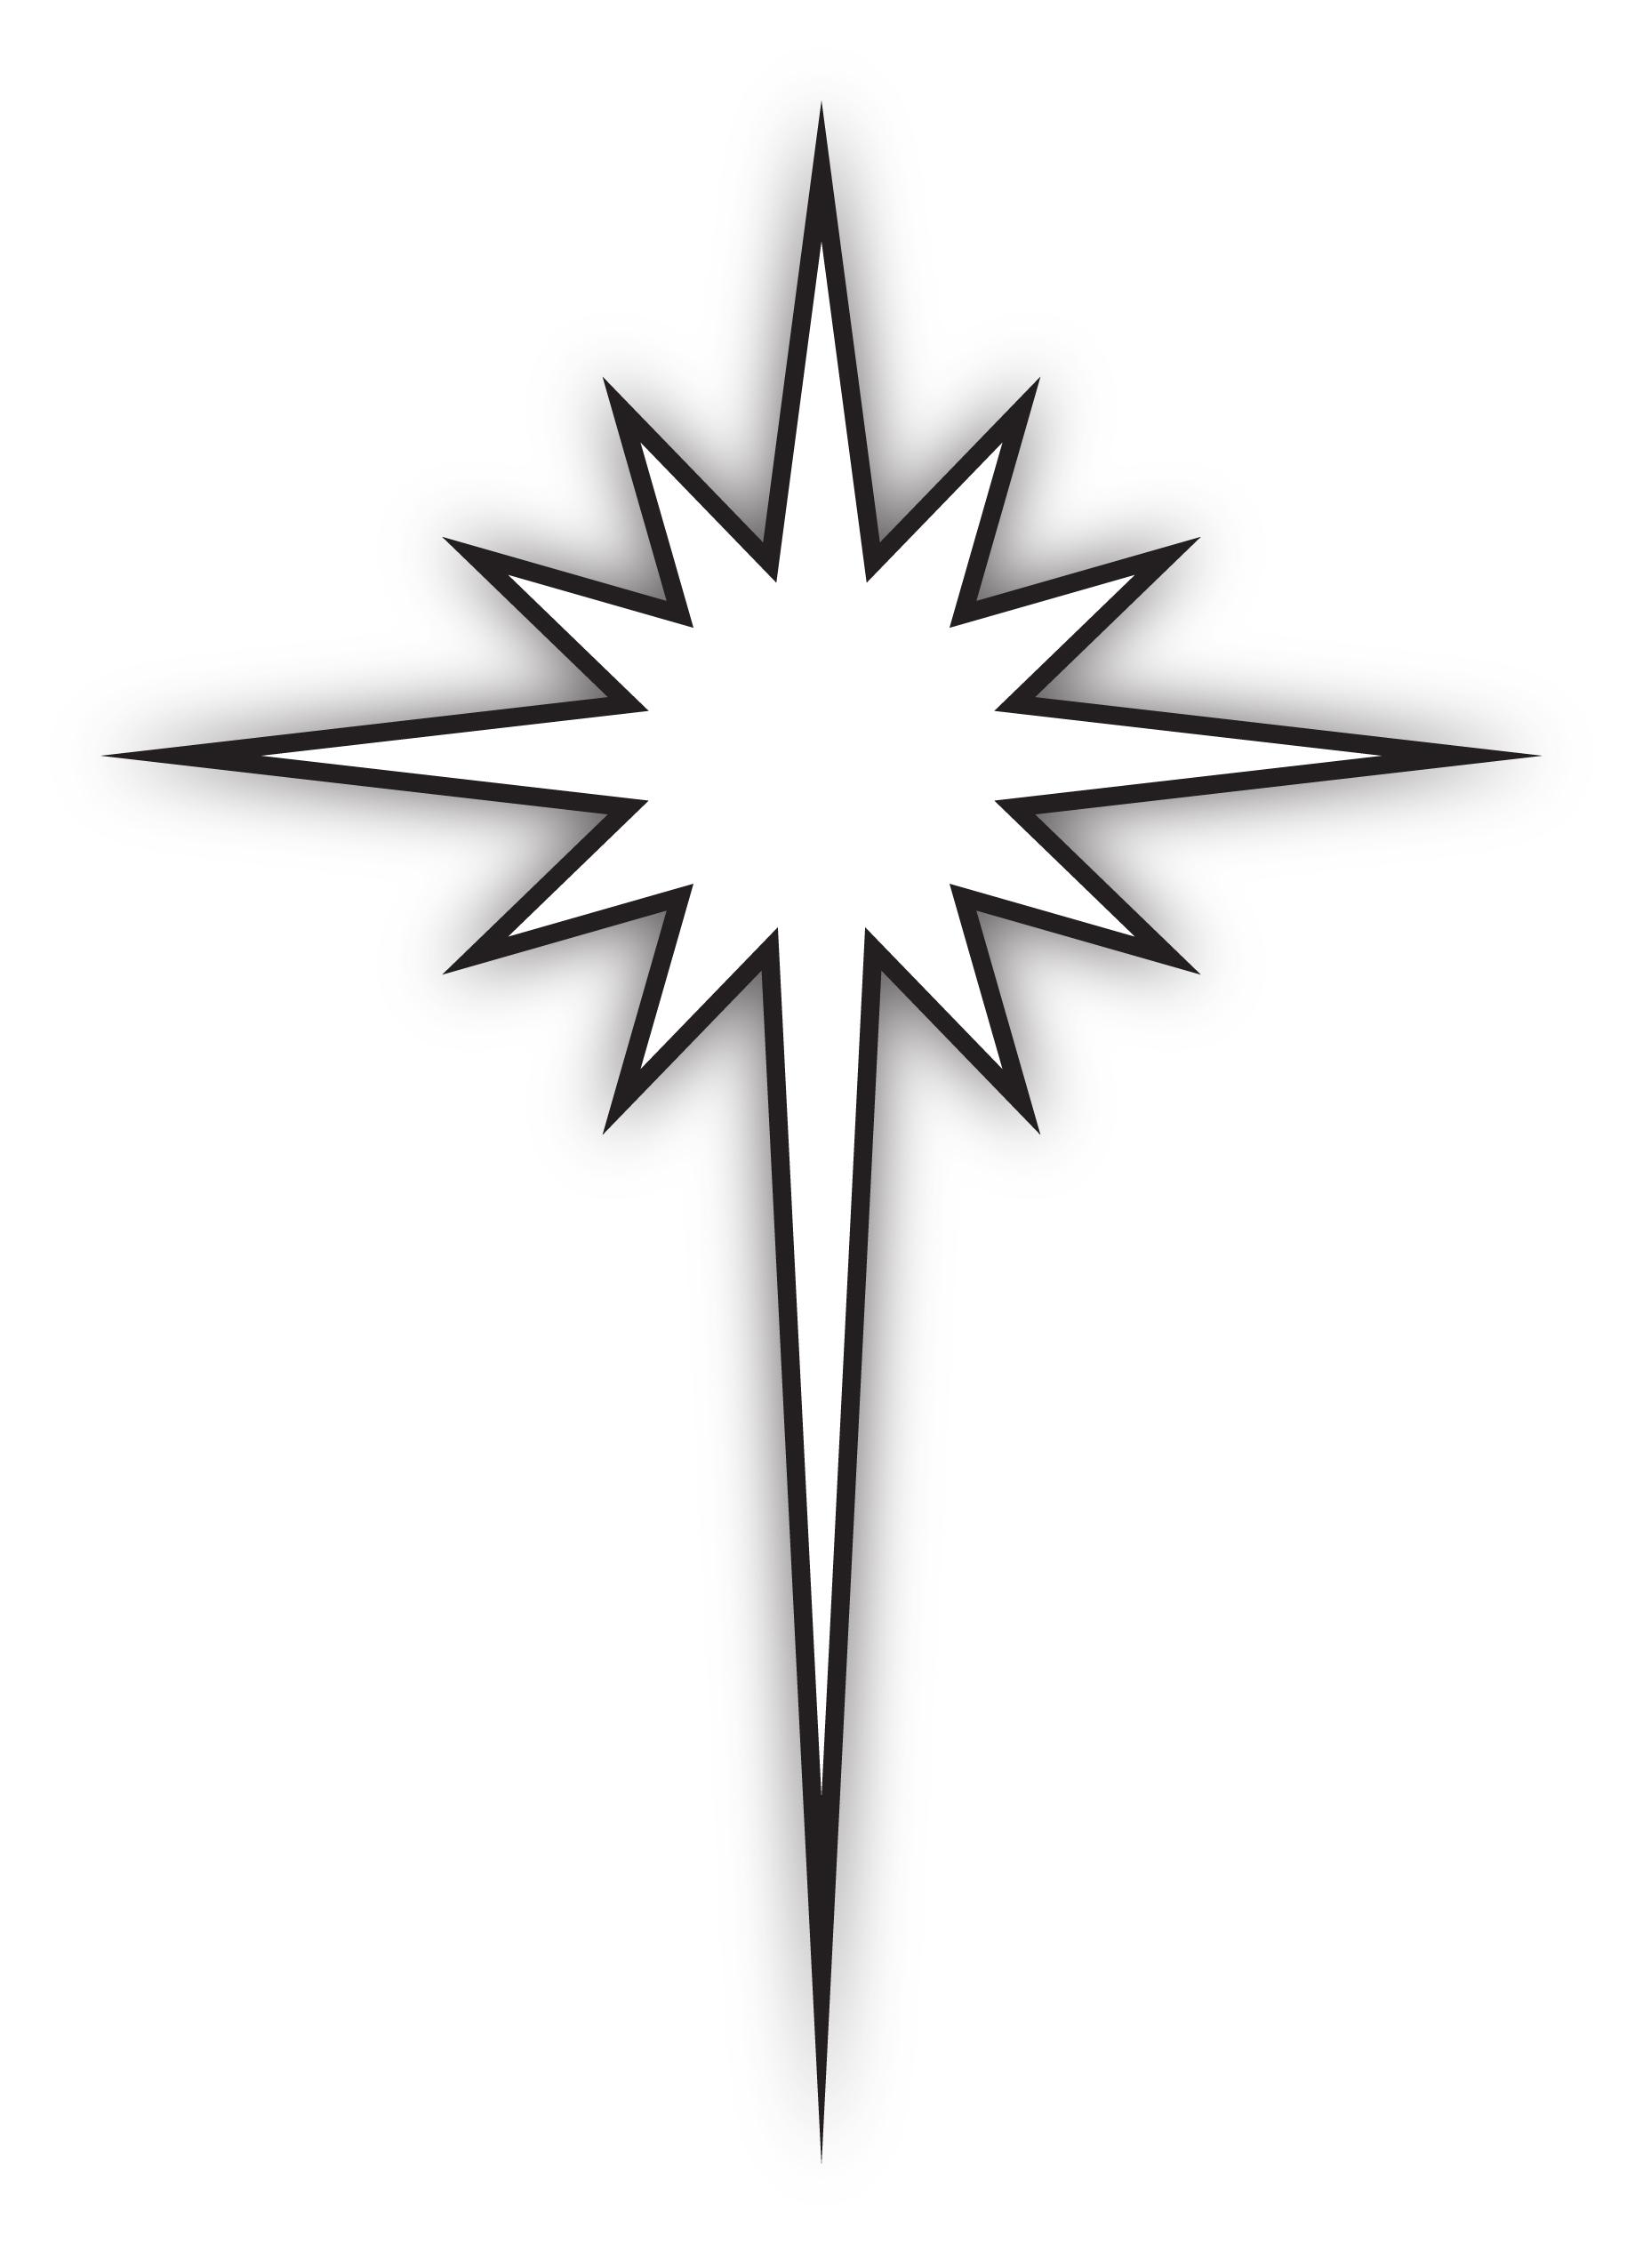 bethlehem star silhouette at getdrawings com free for personal use rh getdrawings com  star of bethlehem clip art free